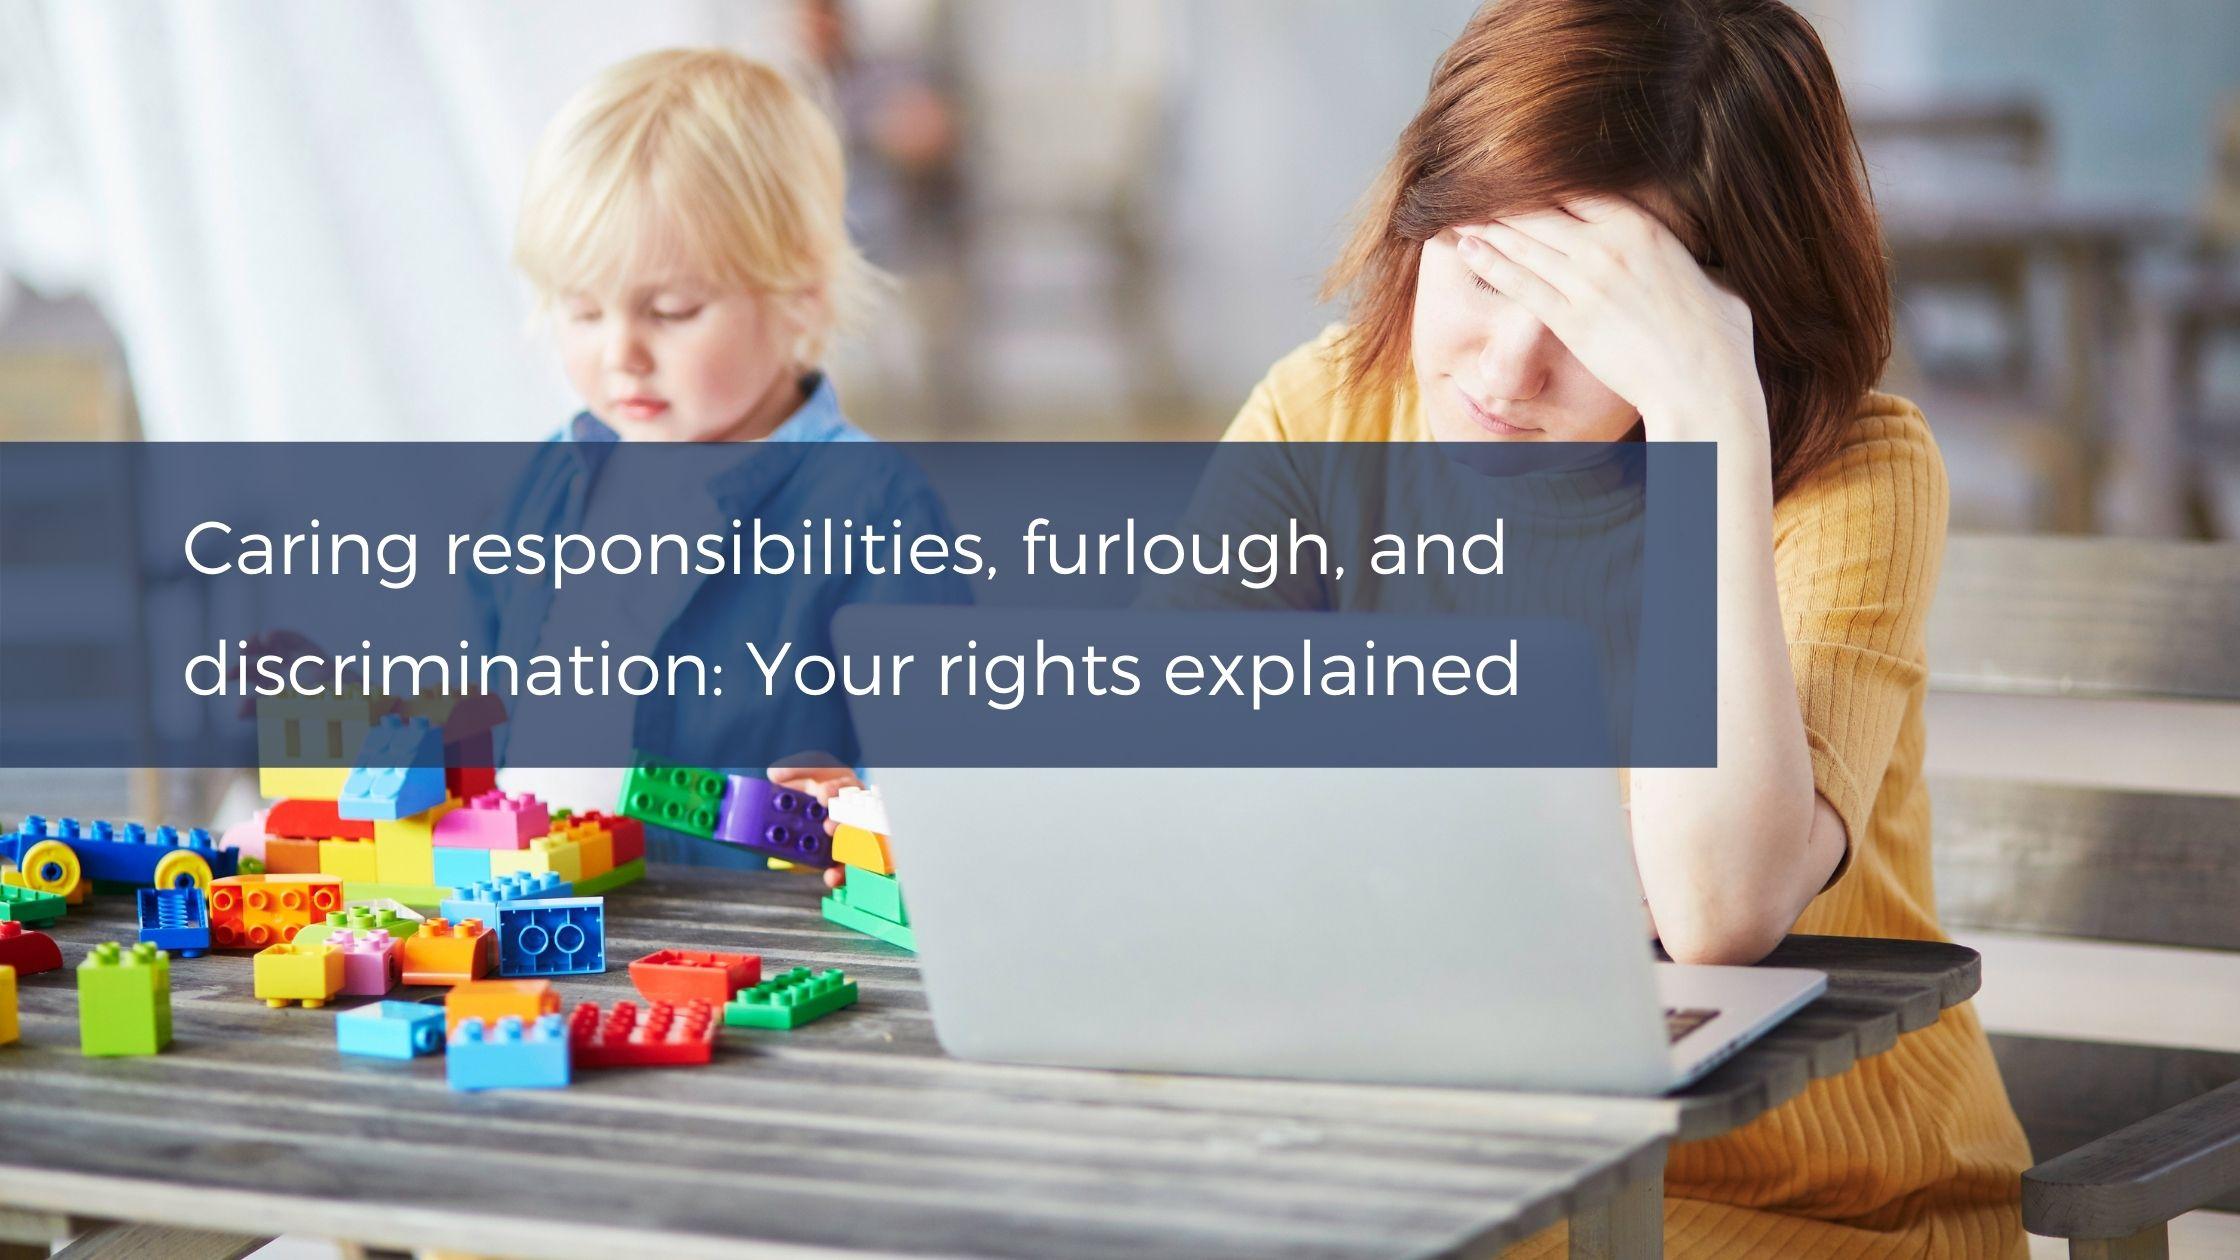 Caring responsibilities, furlough, and discrimination